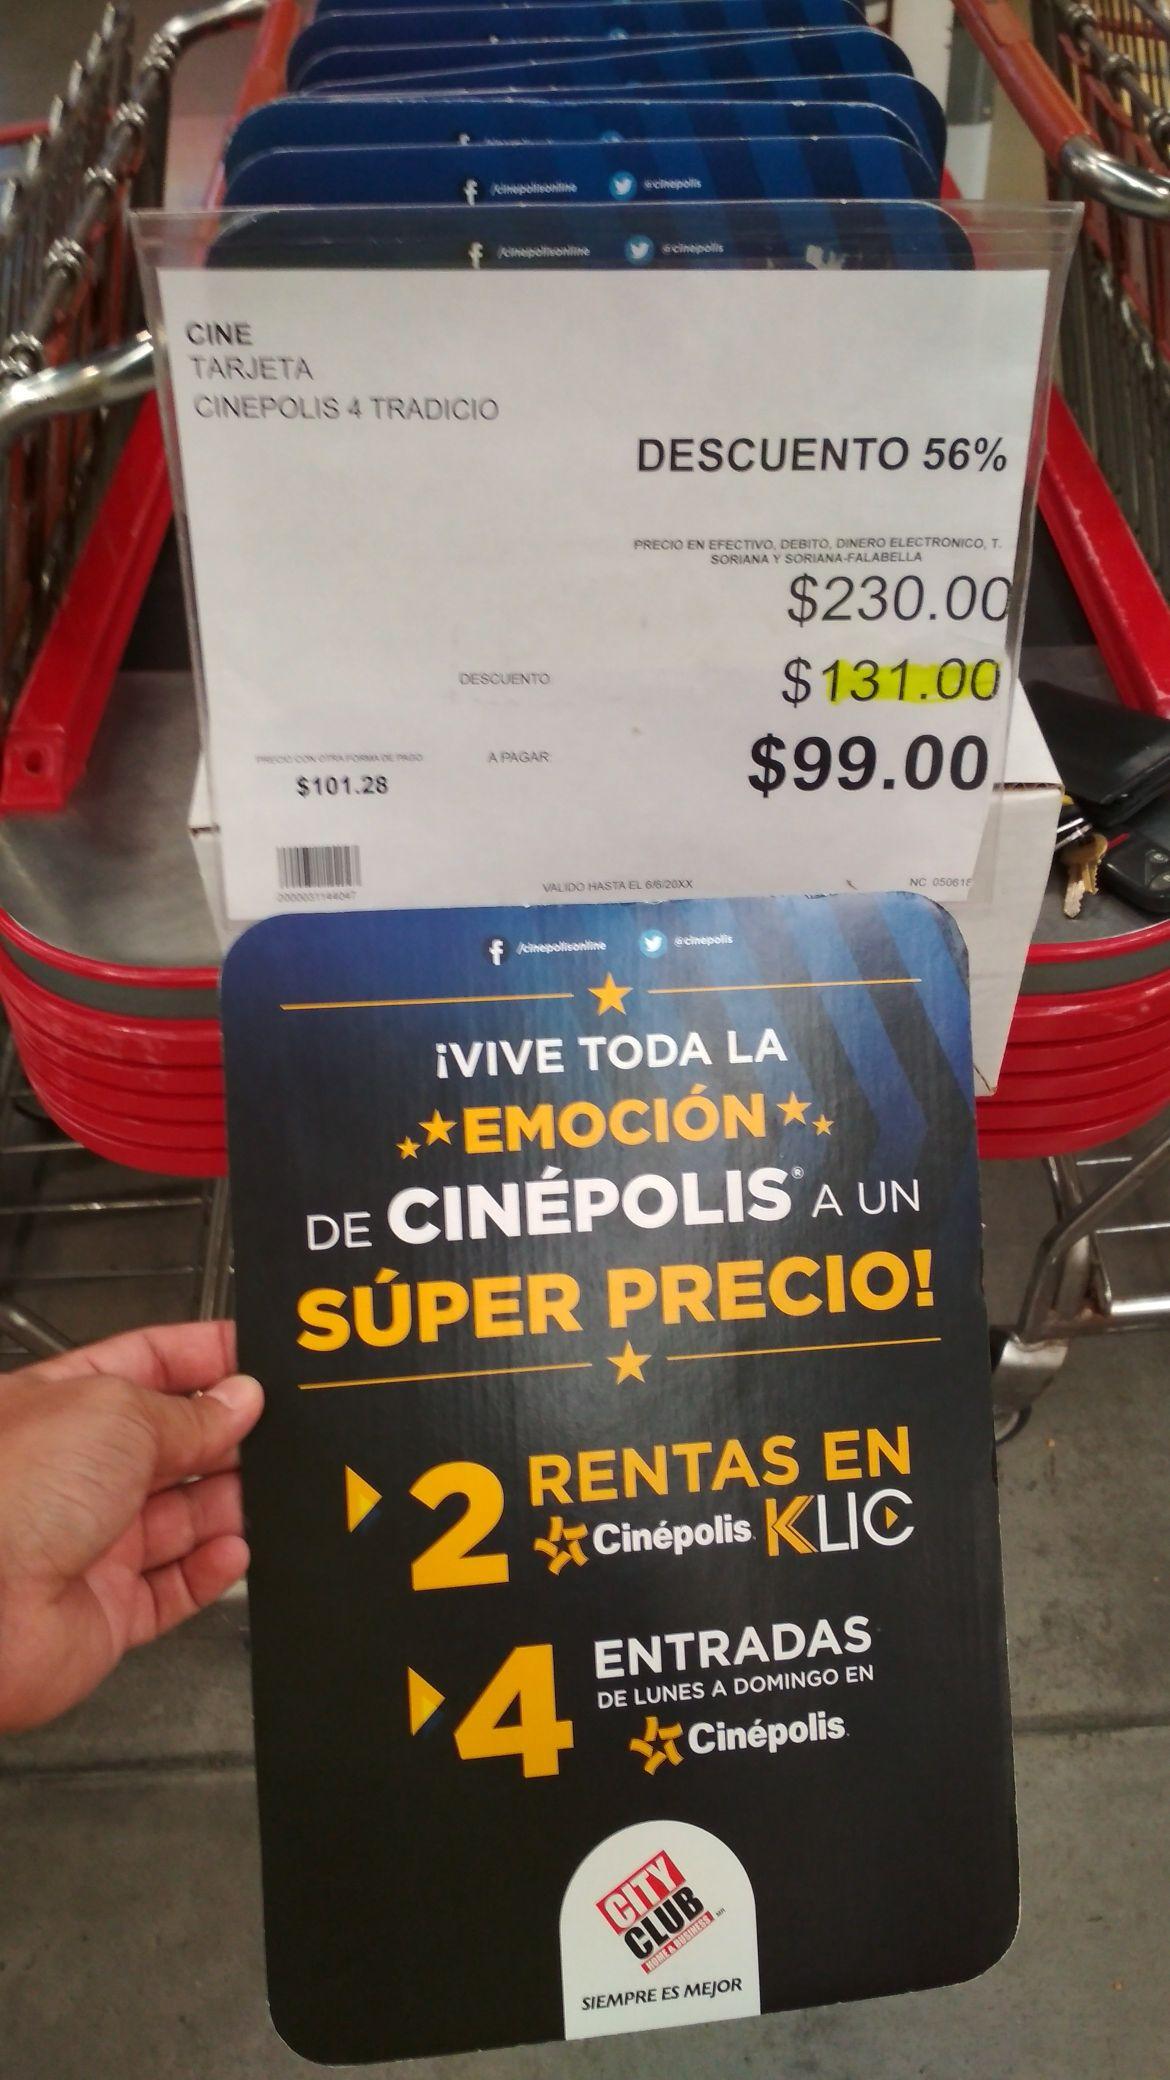 City Club: Cinépolis 4 entradas lunes a domingo + 2 rentas Cinépolis Klic $99